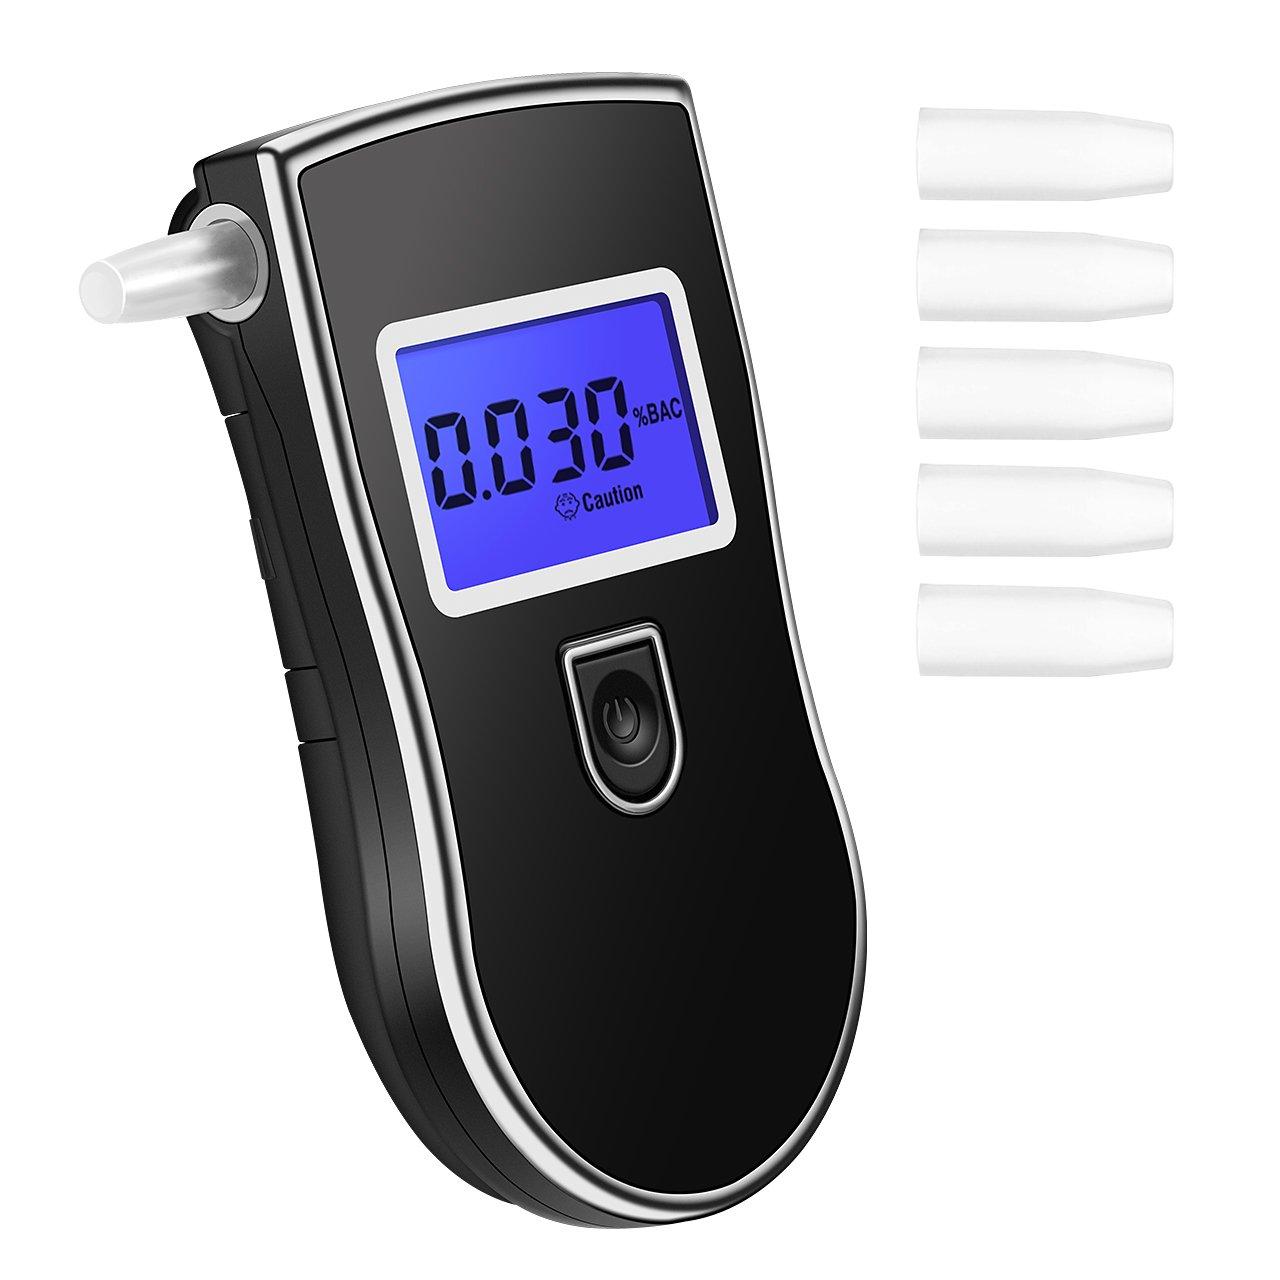 TopElek Alkoholtester Digital Alkohol Tester Analyzer Detector Atemalkohol-Tester mit LCD Display (5 Mundstü cke). VP-FR-91EC